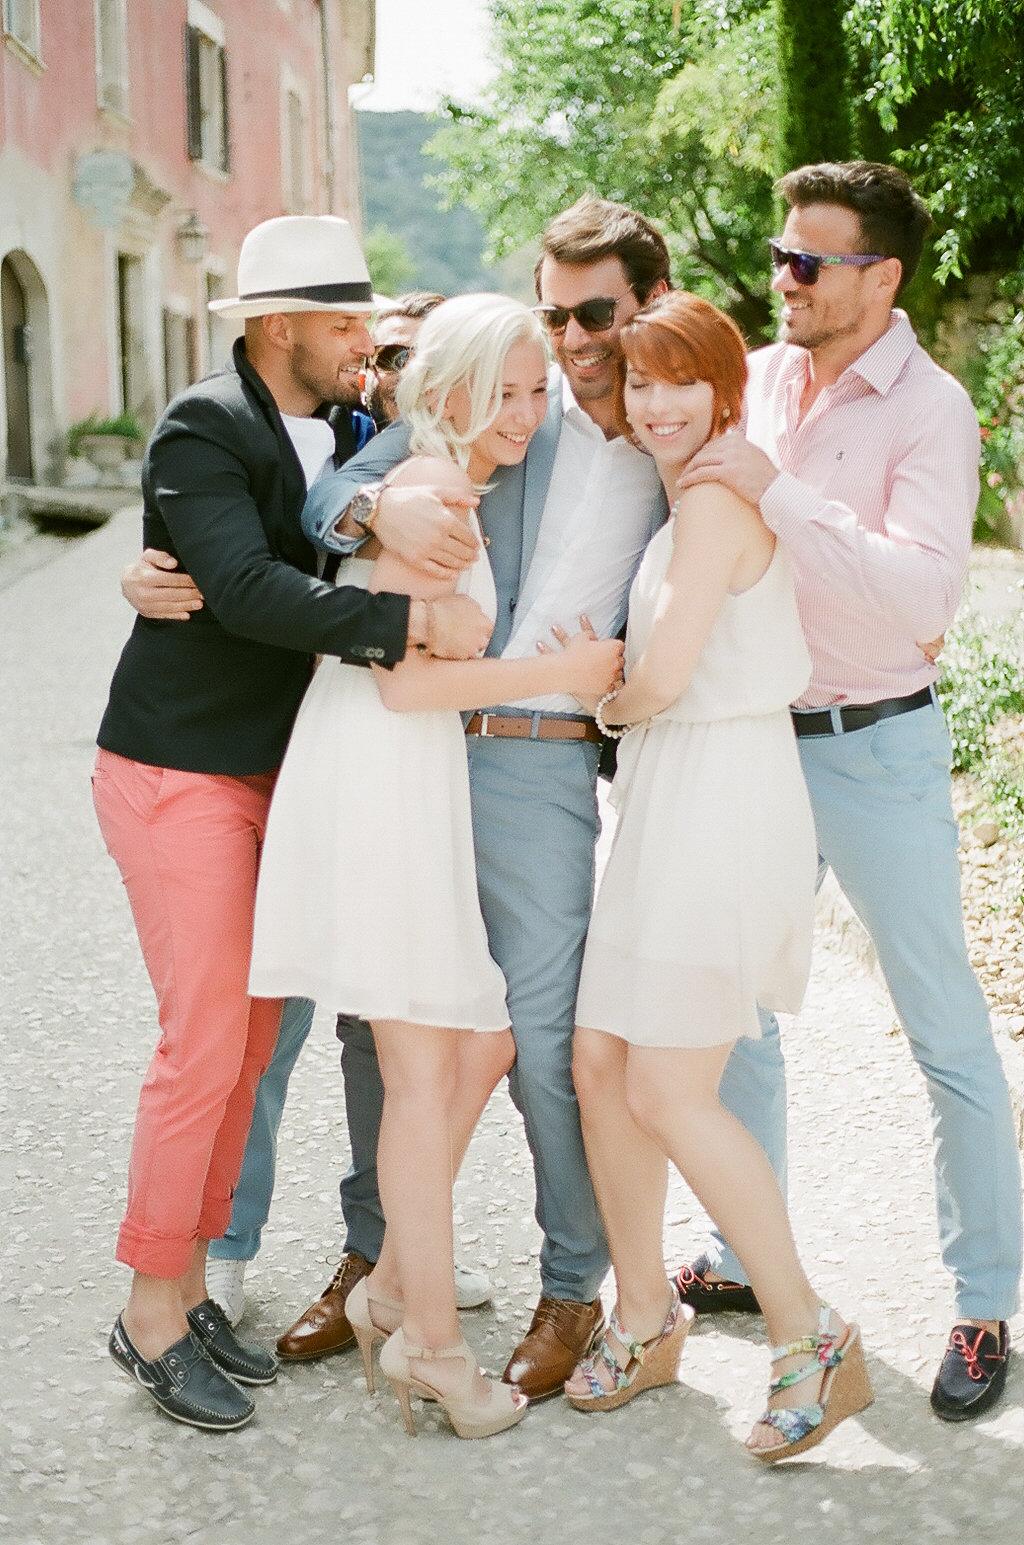 le coeur dans les etoiles - wedding planner - provence - luberon - alpilles - drome - vaucluse - sardaigne - italie - organisation - mariage - shooting - dolce vita - valery villard-206